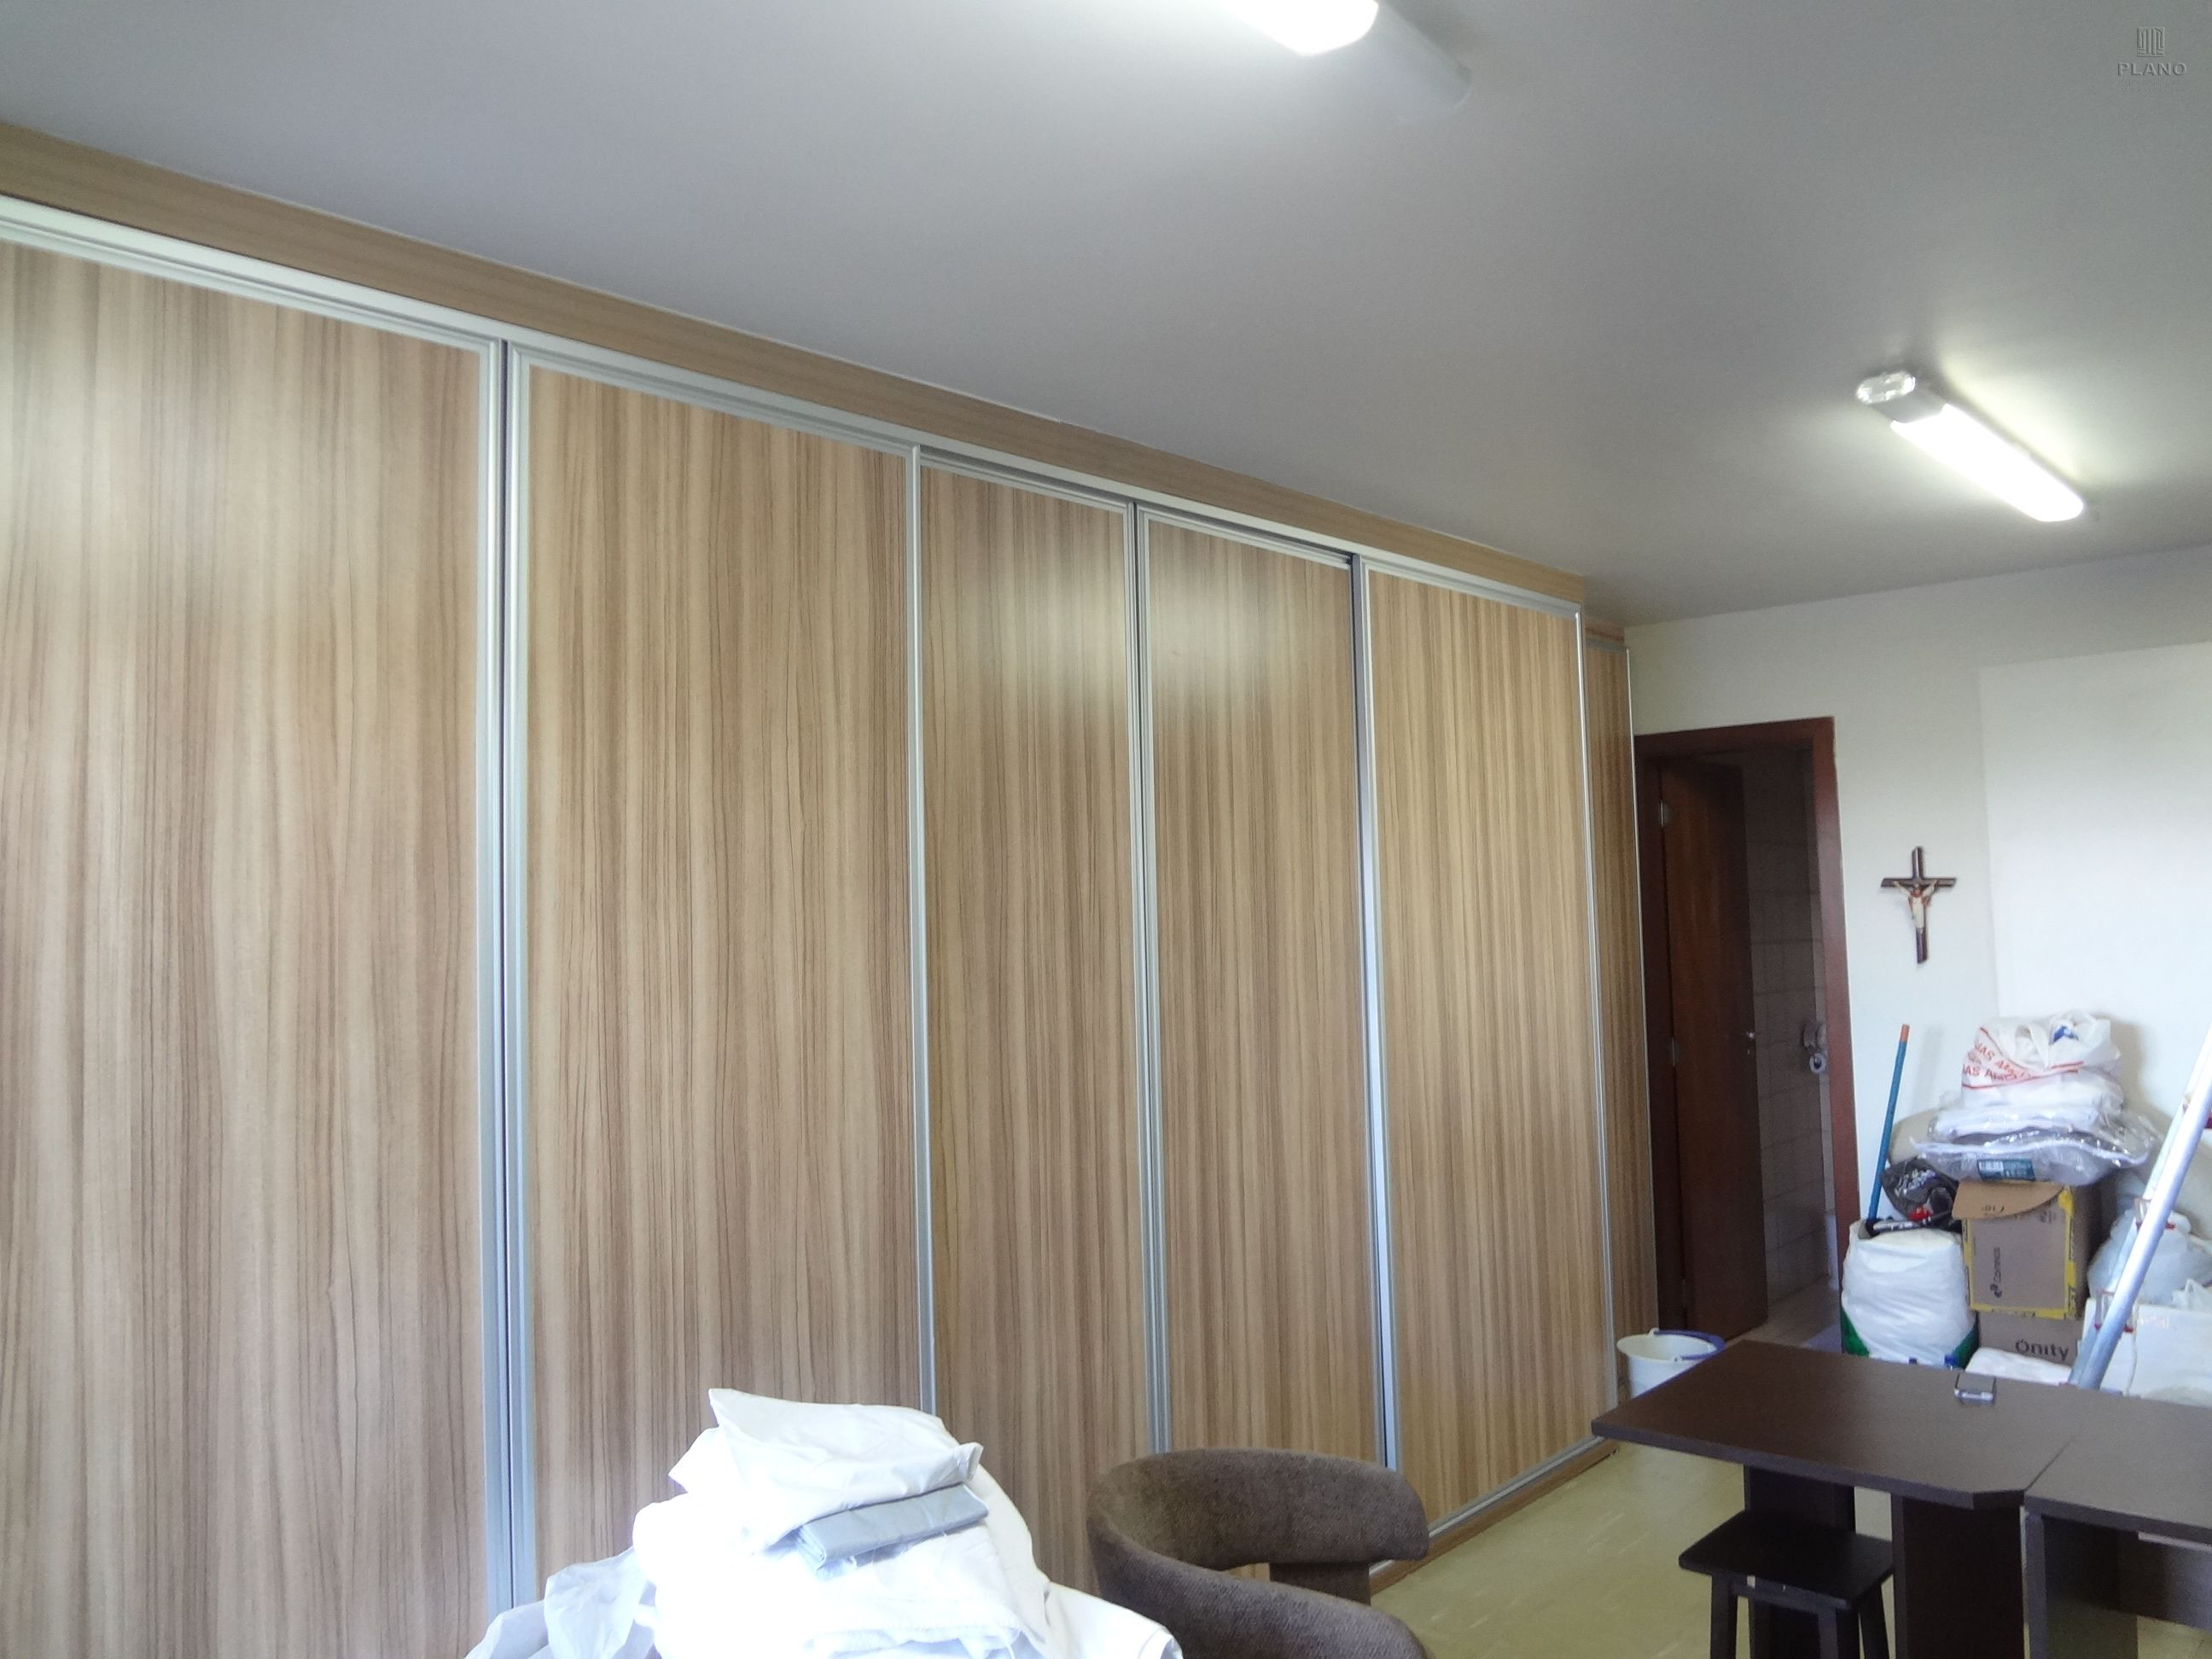 Salas/conjuntos em Asa Norte, Brasília - DF